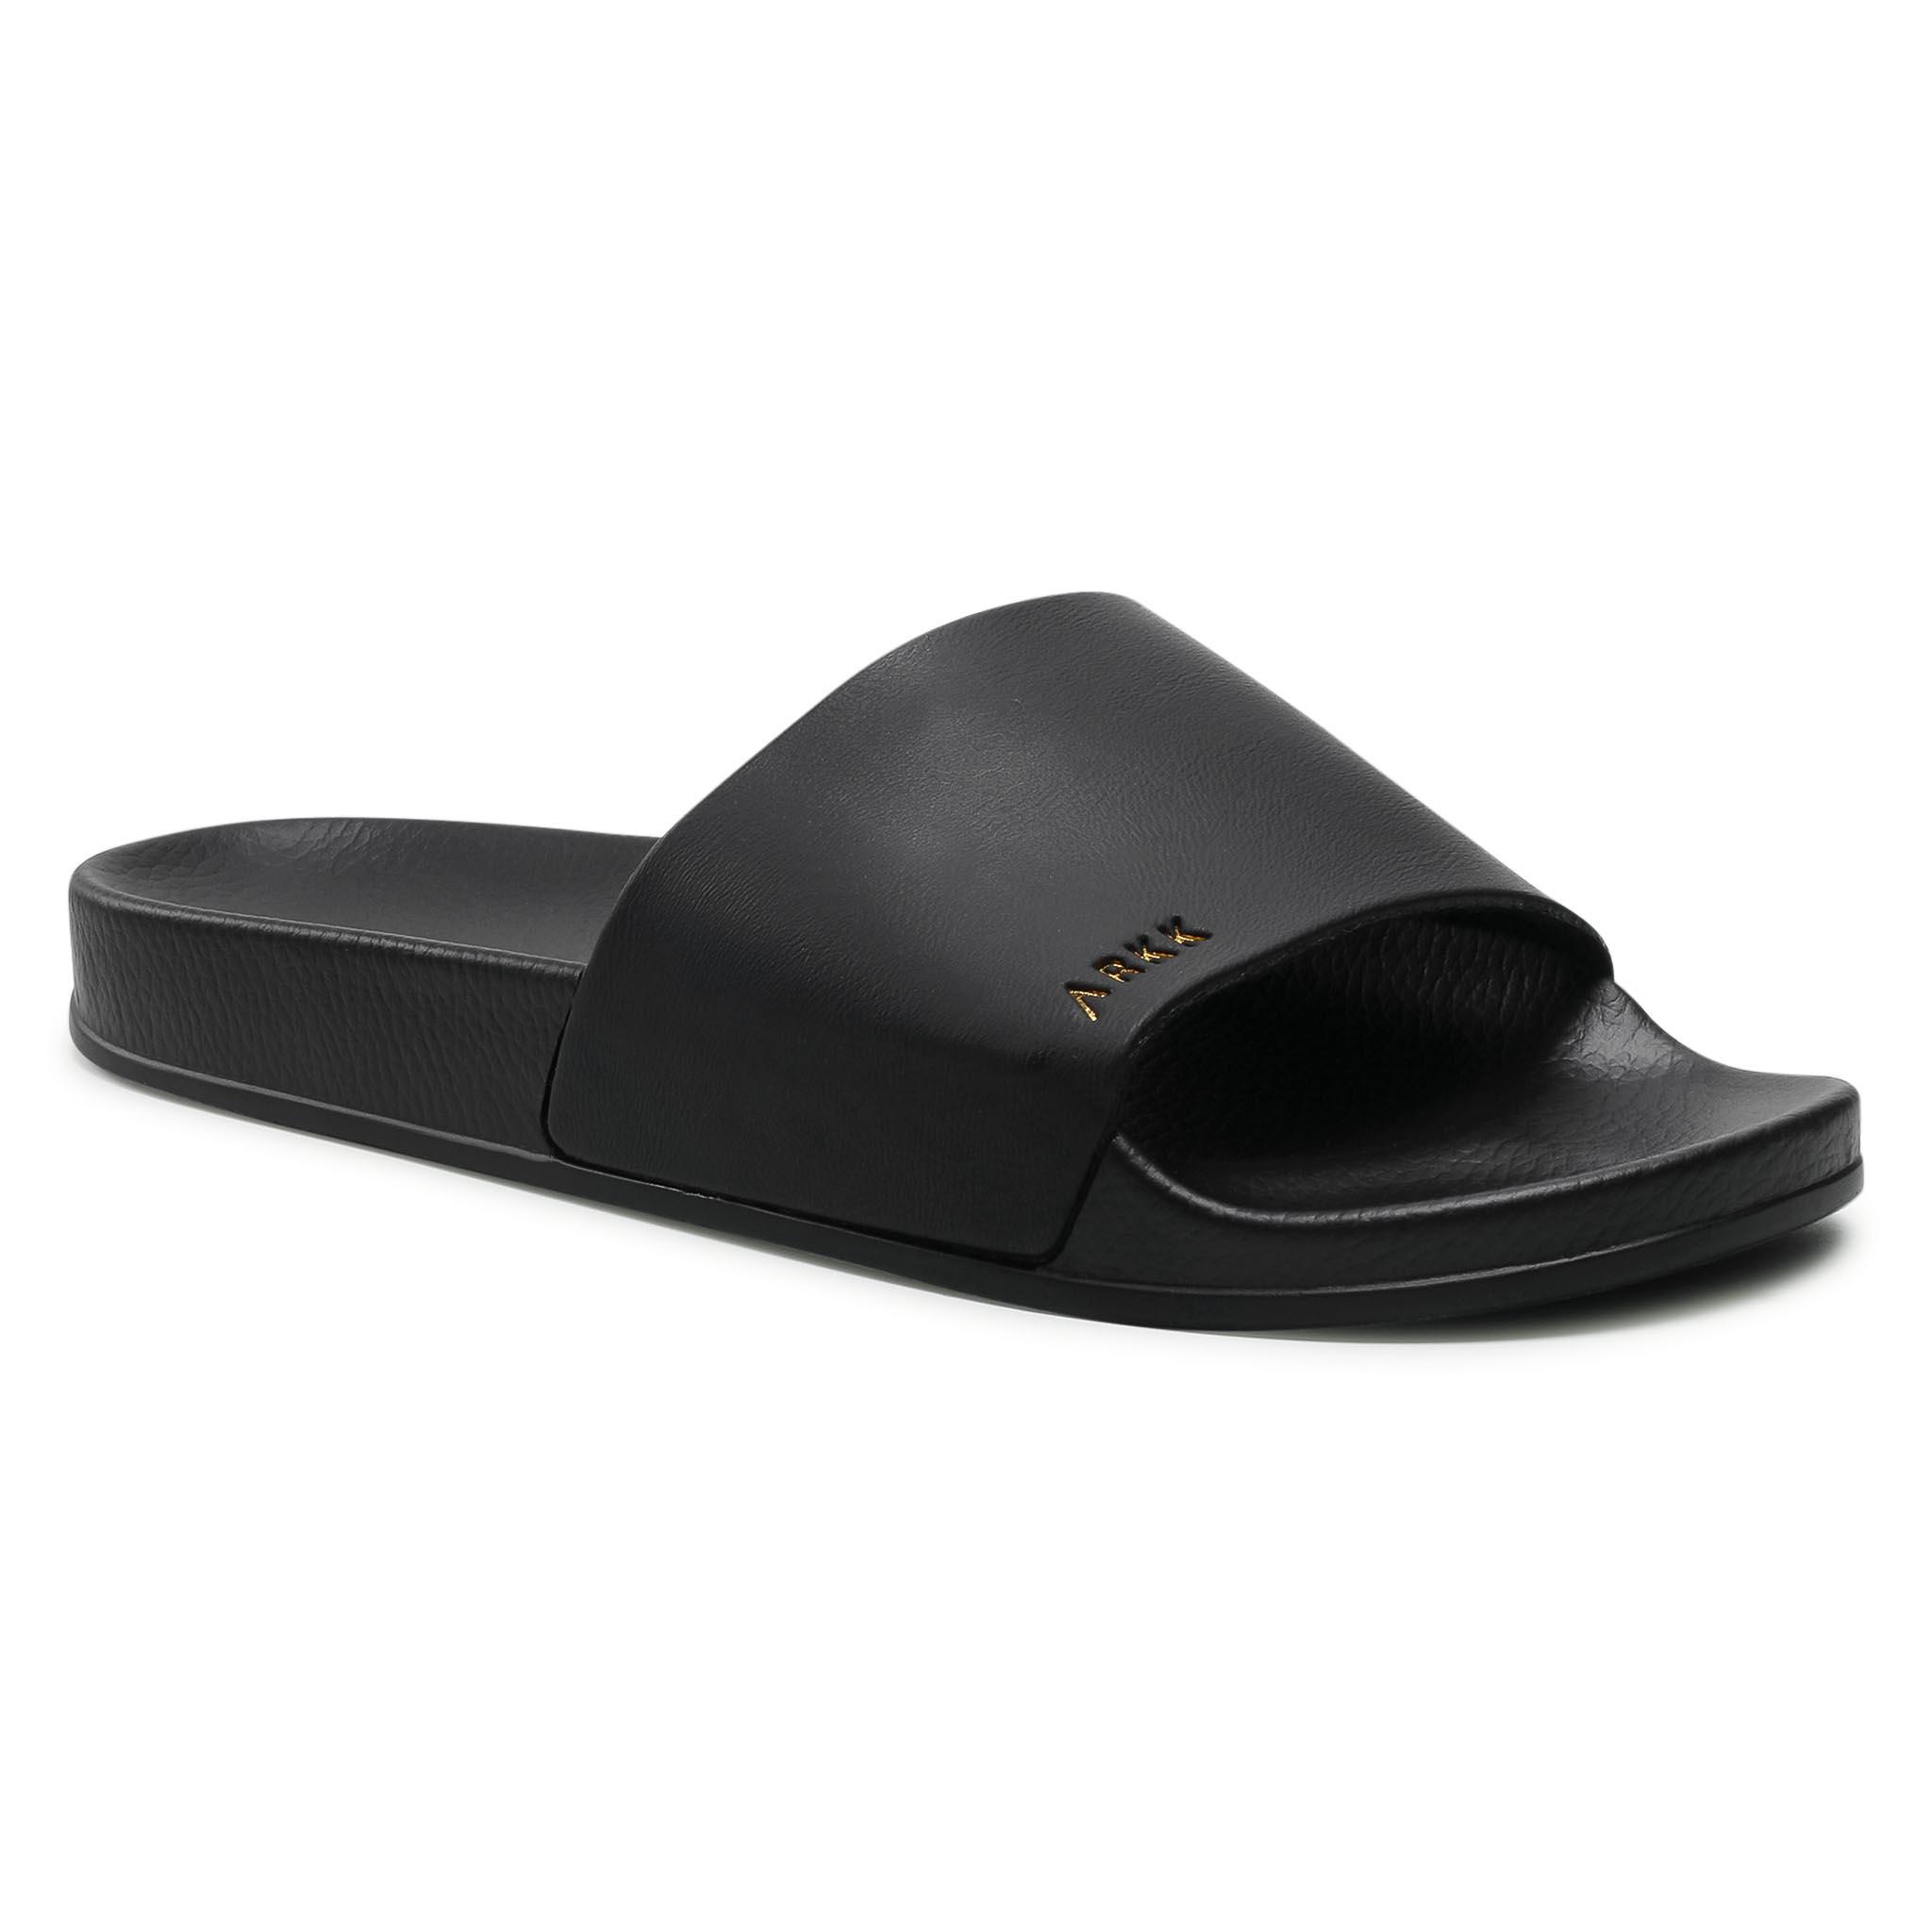 Image of Pantoletten ARKK COPENHAGEN - Slides Premium CO6403-0099-M Black